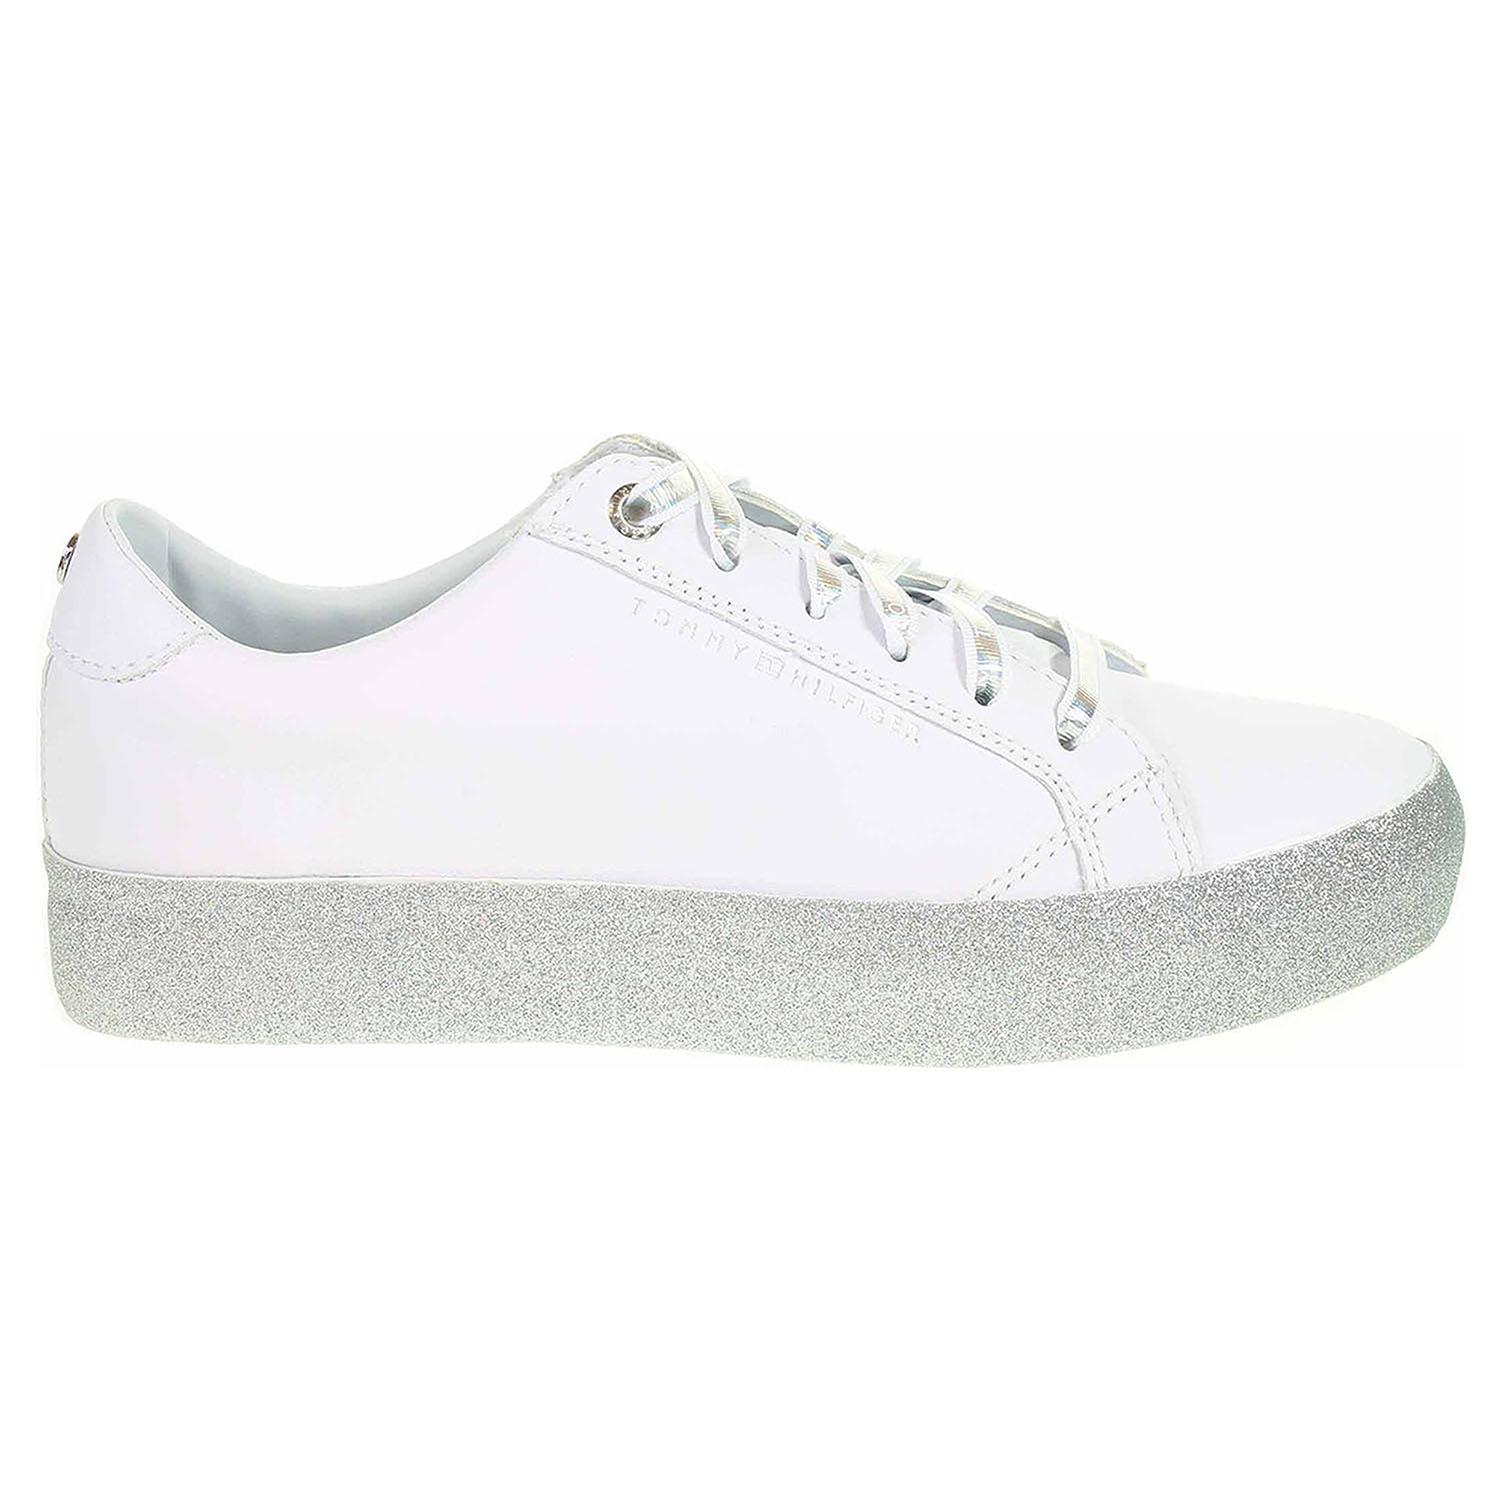 Ecco Tommy Hilfiger dámská obuv FW0FW03962 white 23200898 930f1bbb2b8